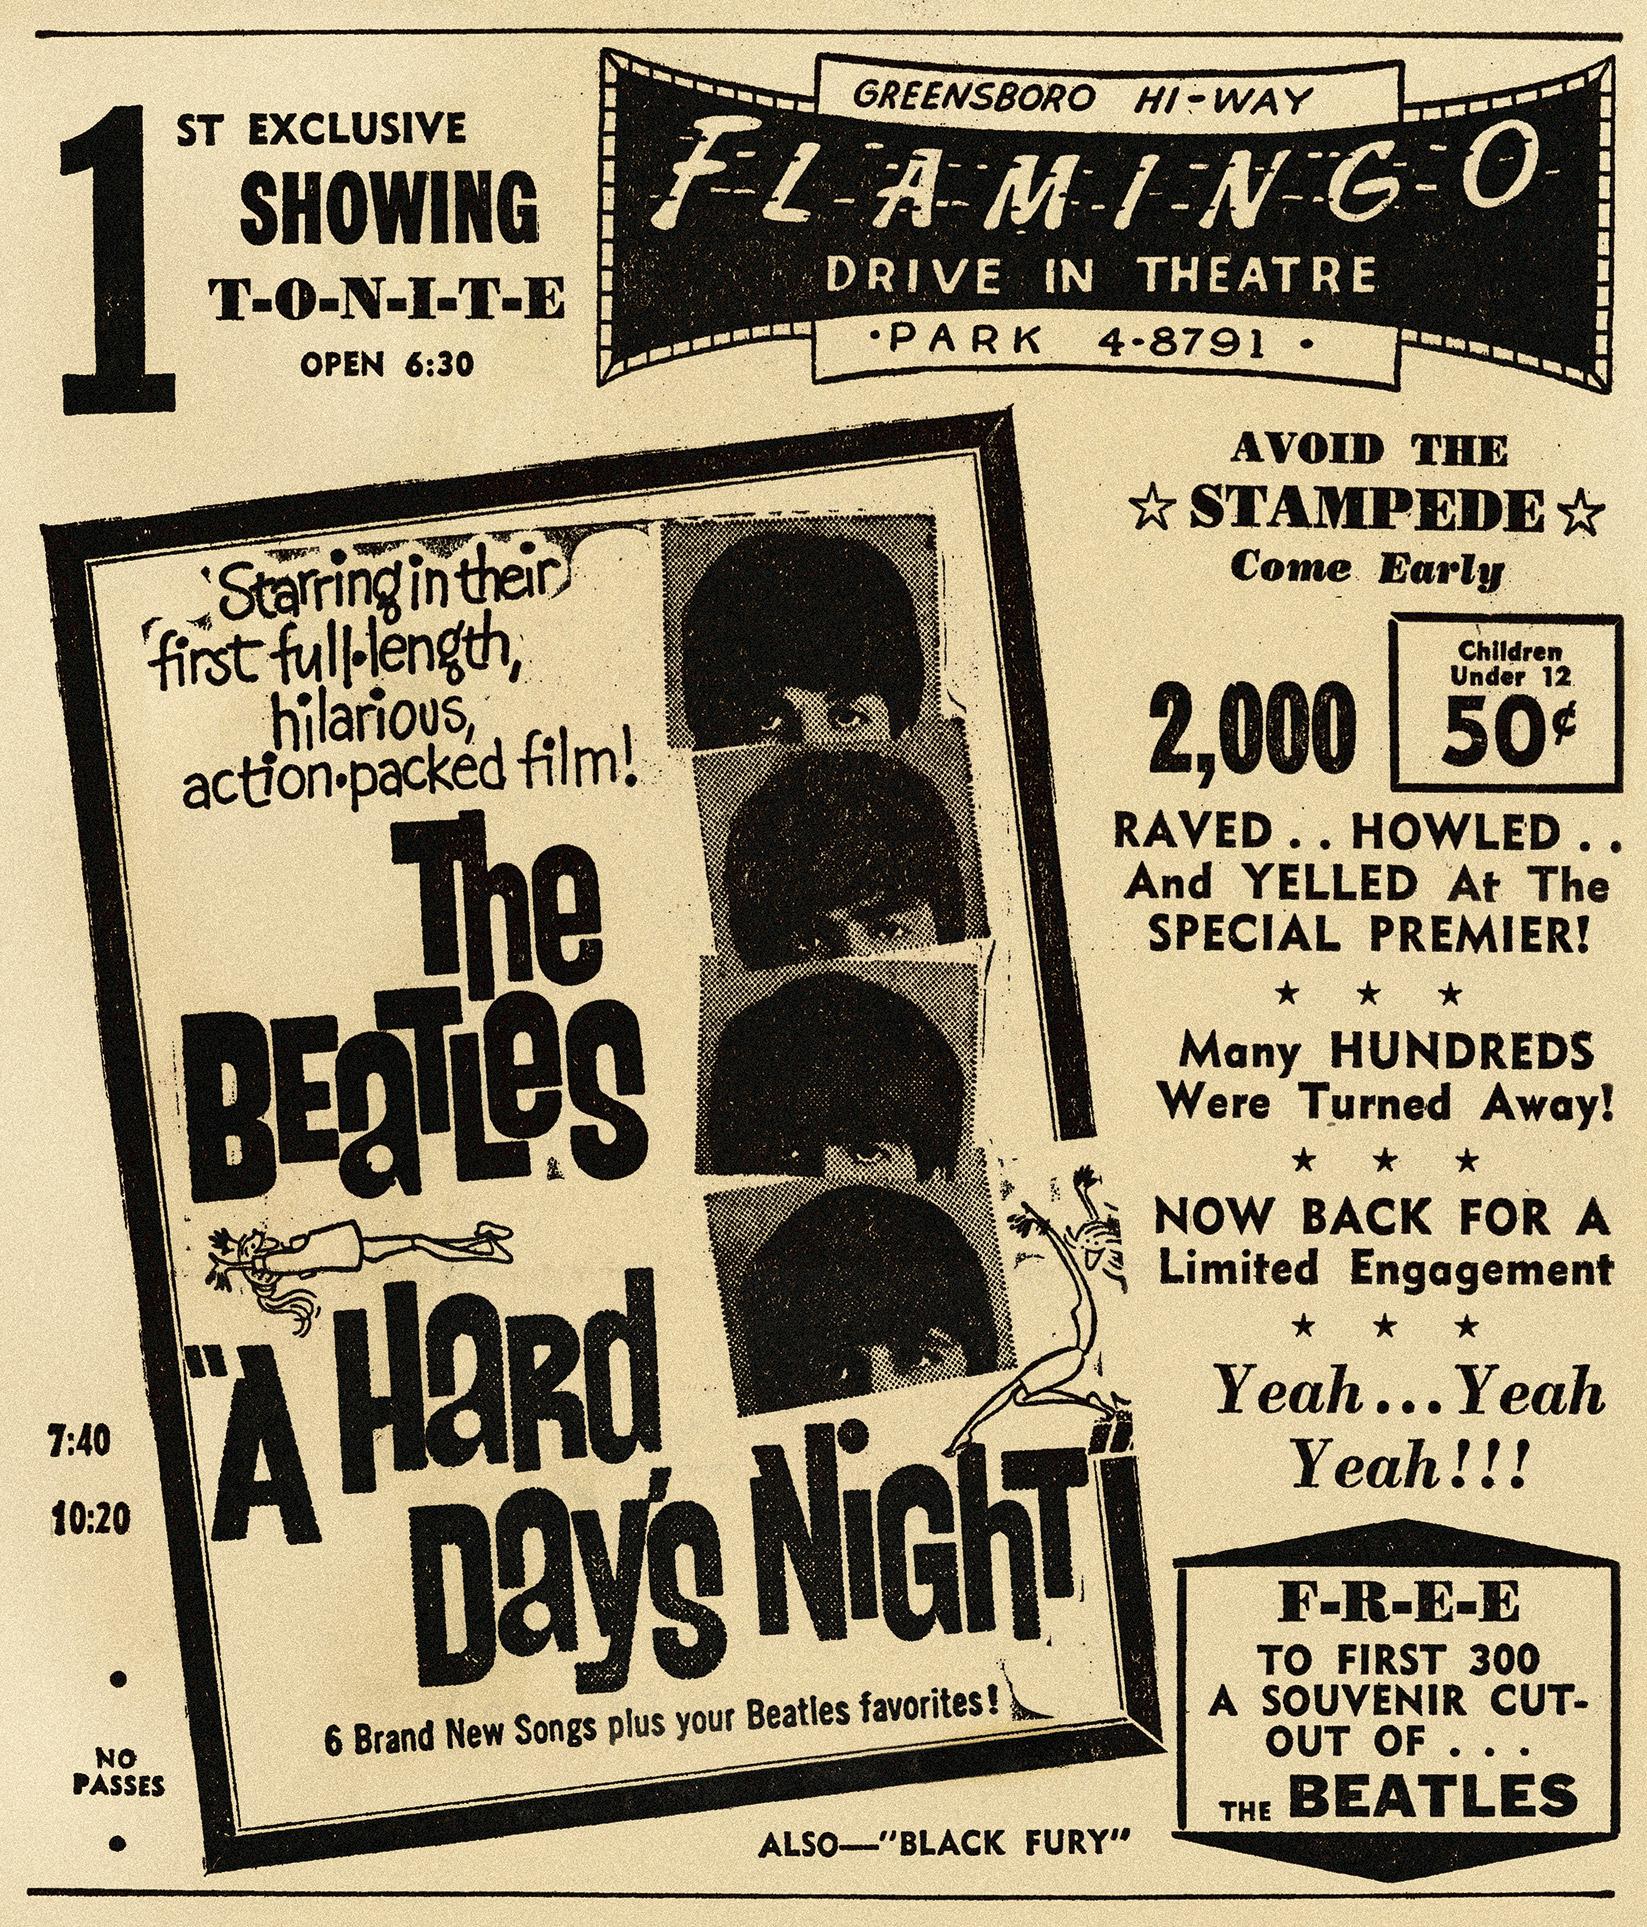 A Hard Day's Night newspaper advertisement, 1964.